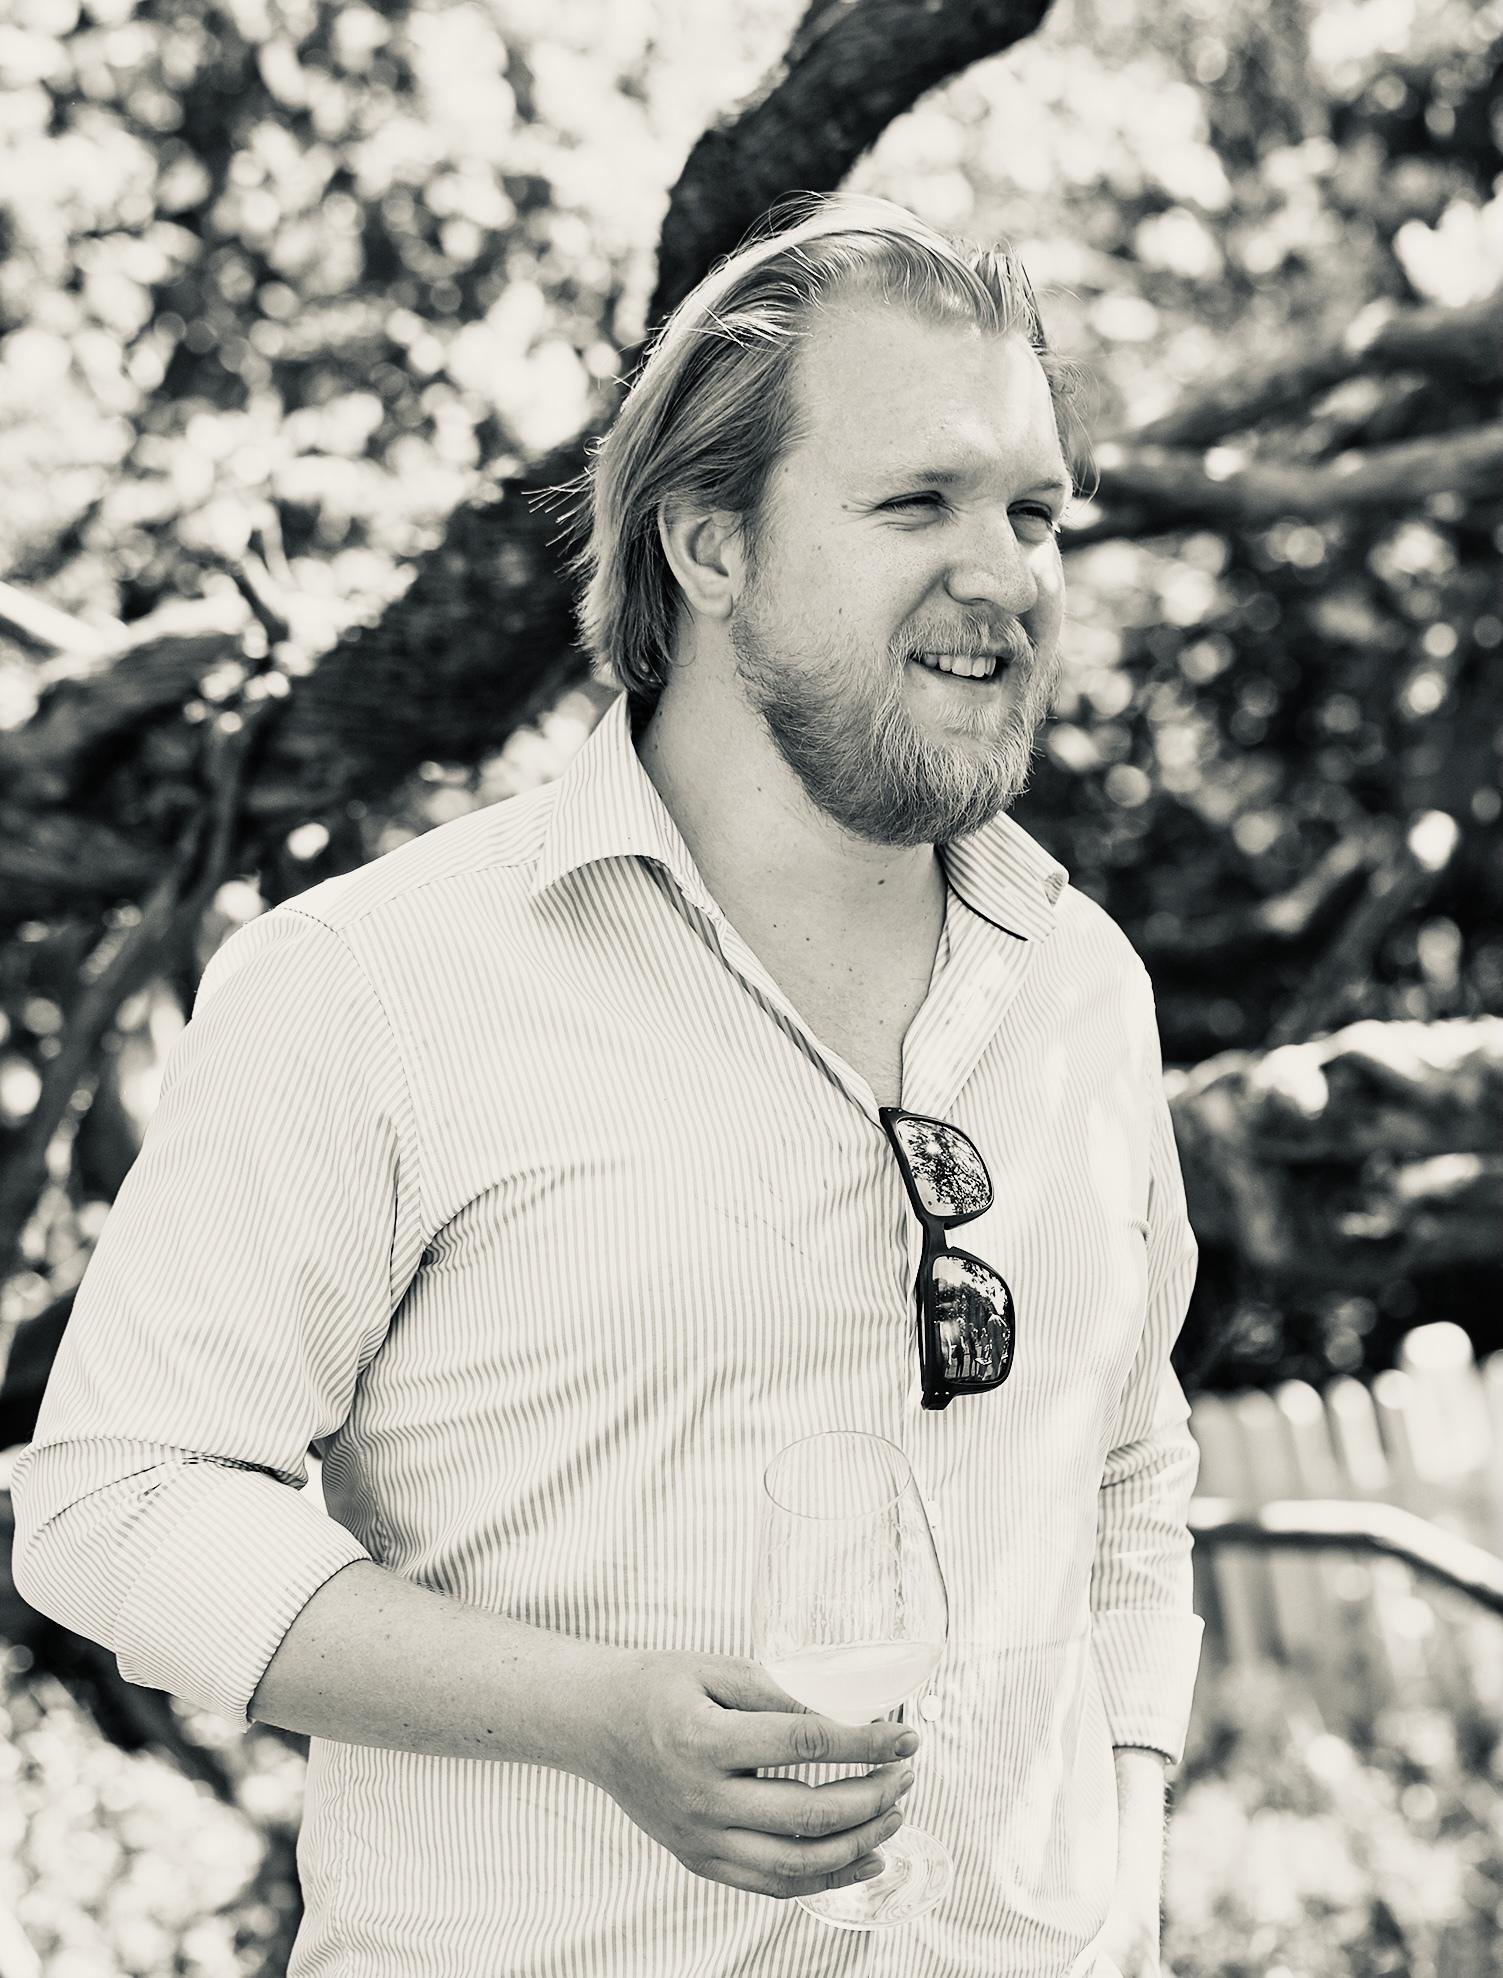 Petter Svanæs